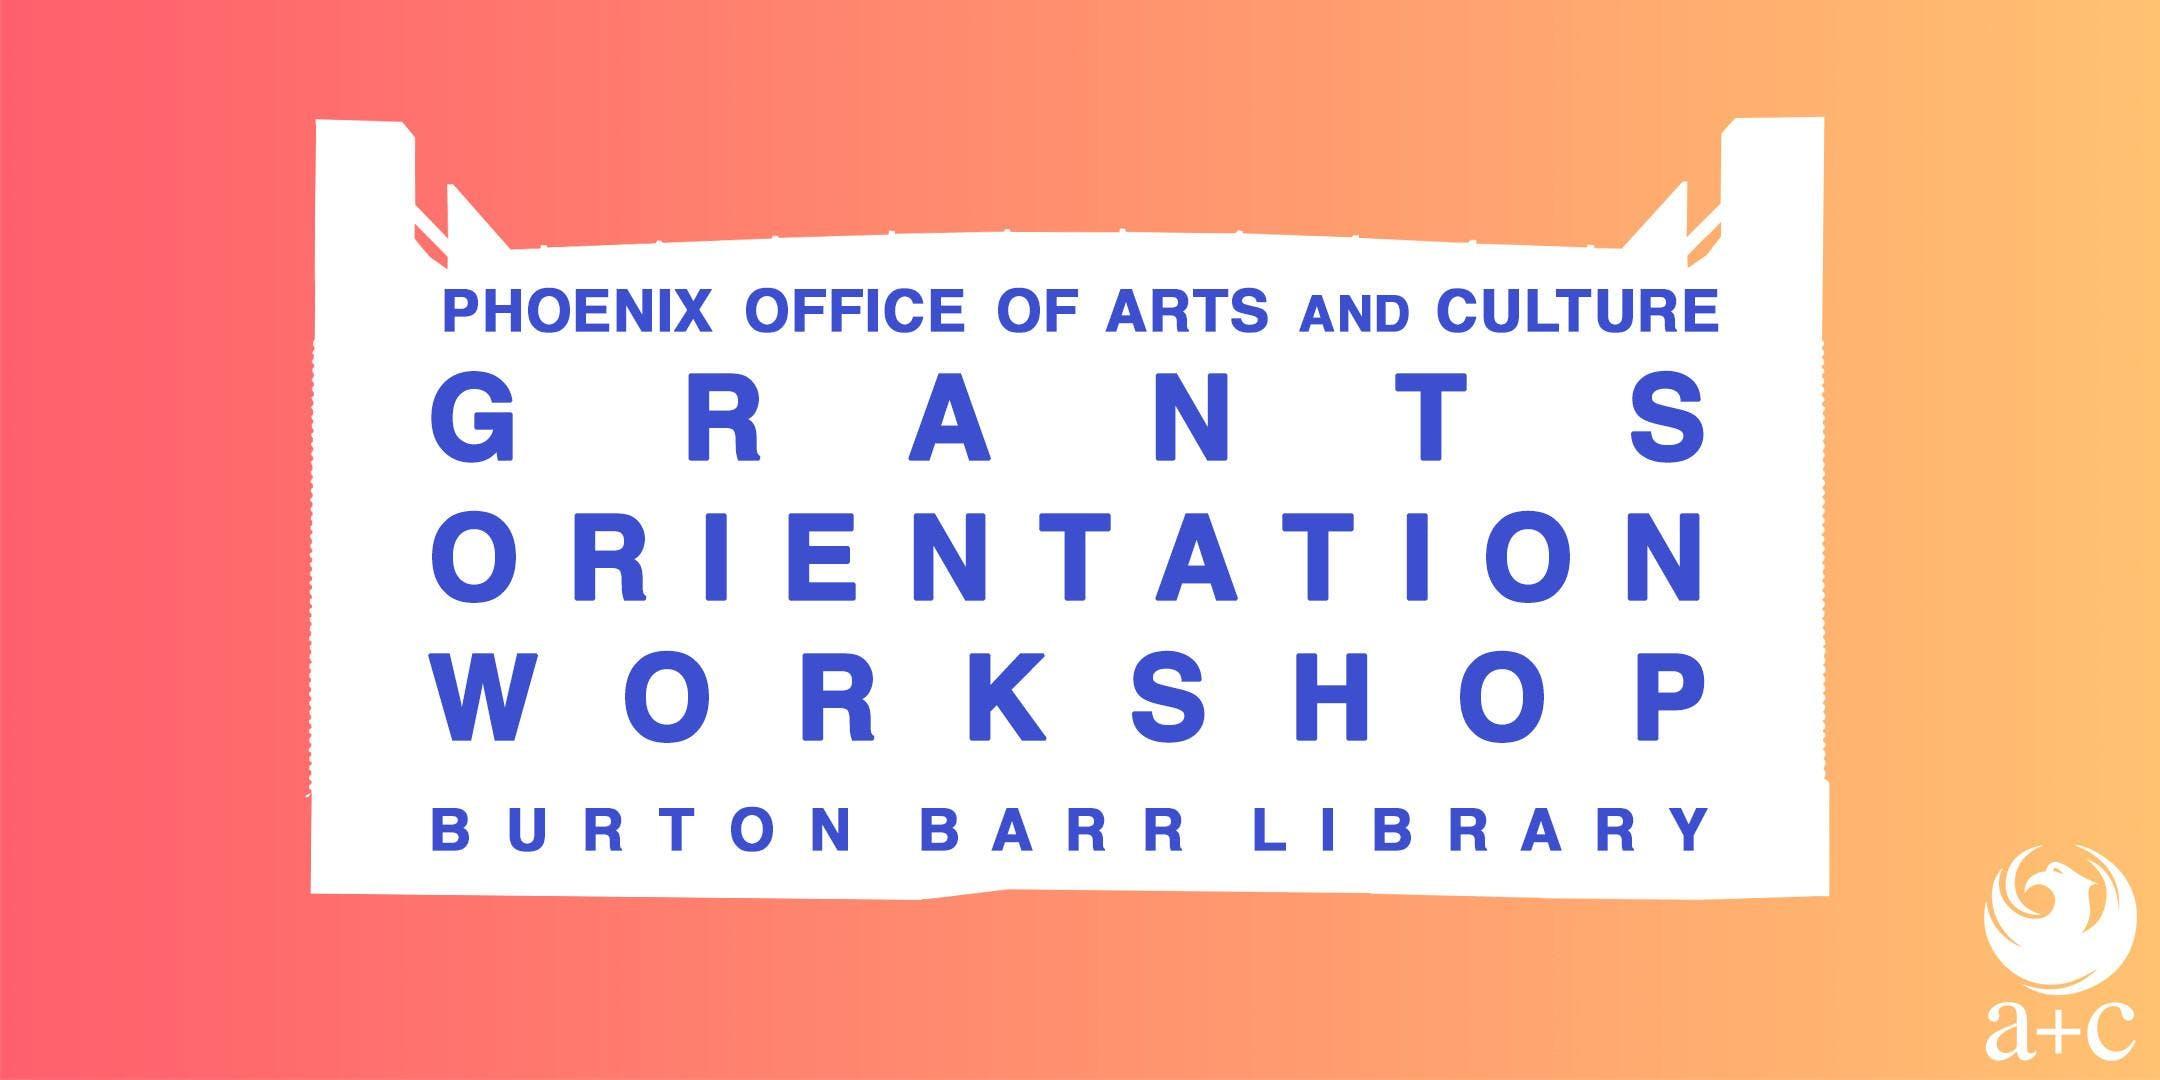 Grants Orientation Workshop at Burton Barr Central Library